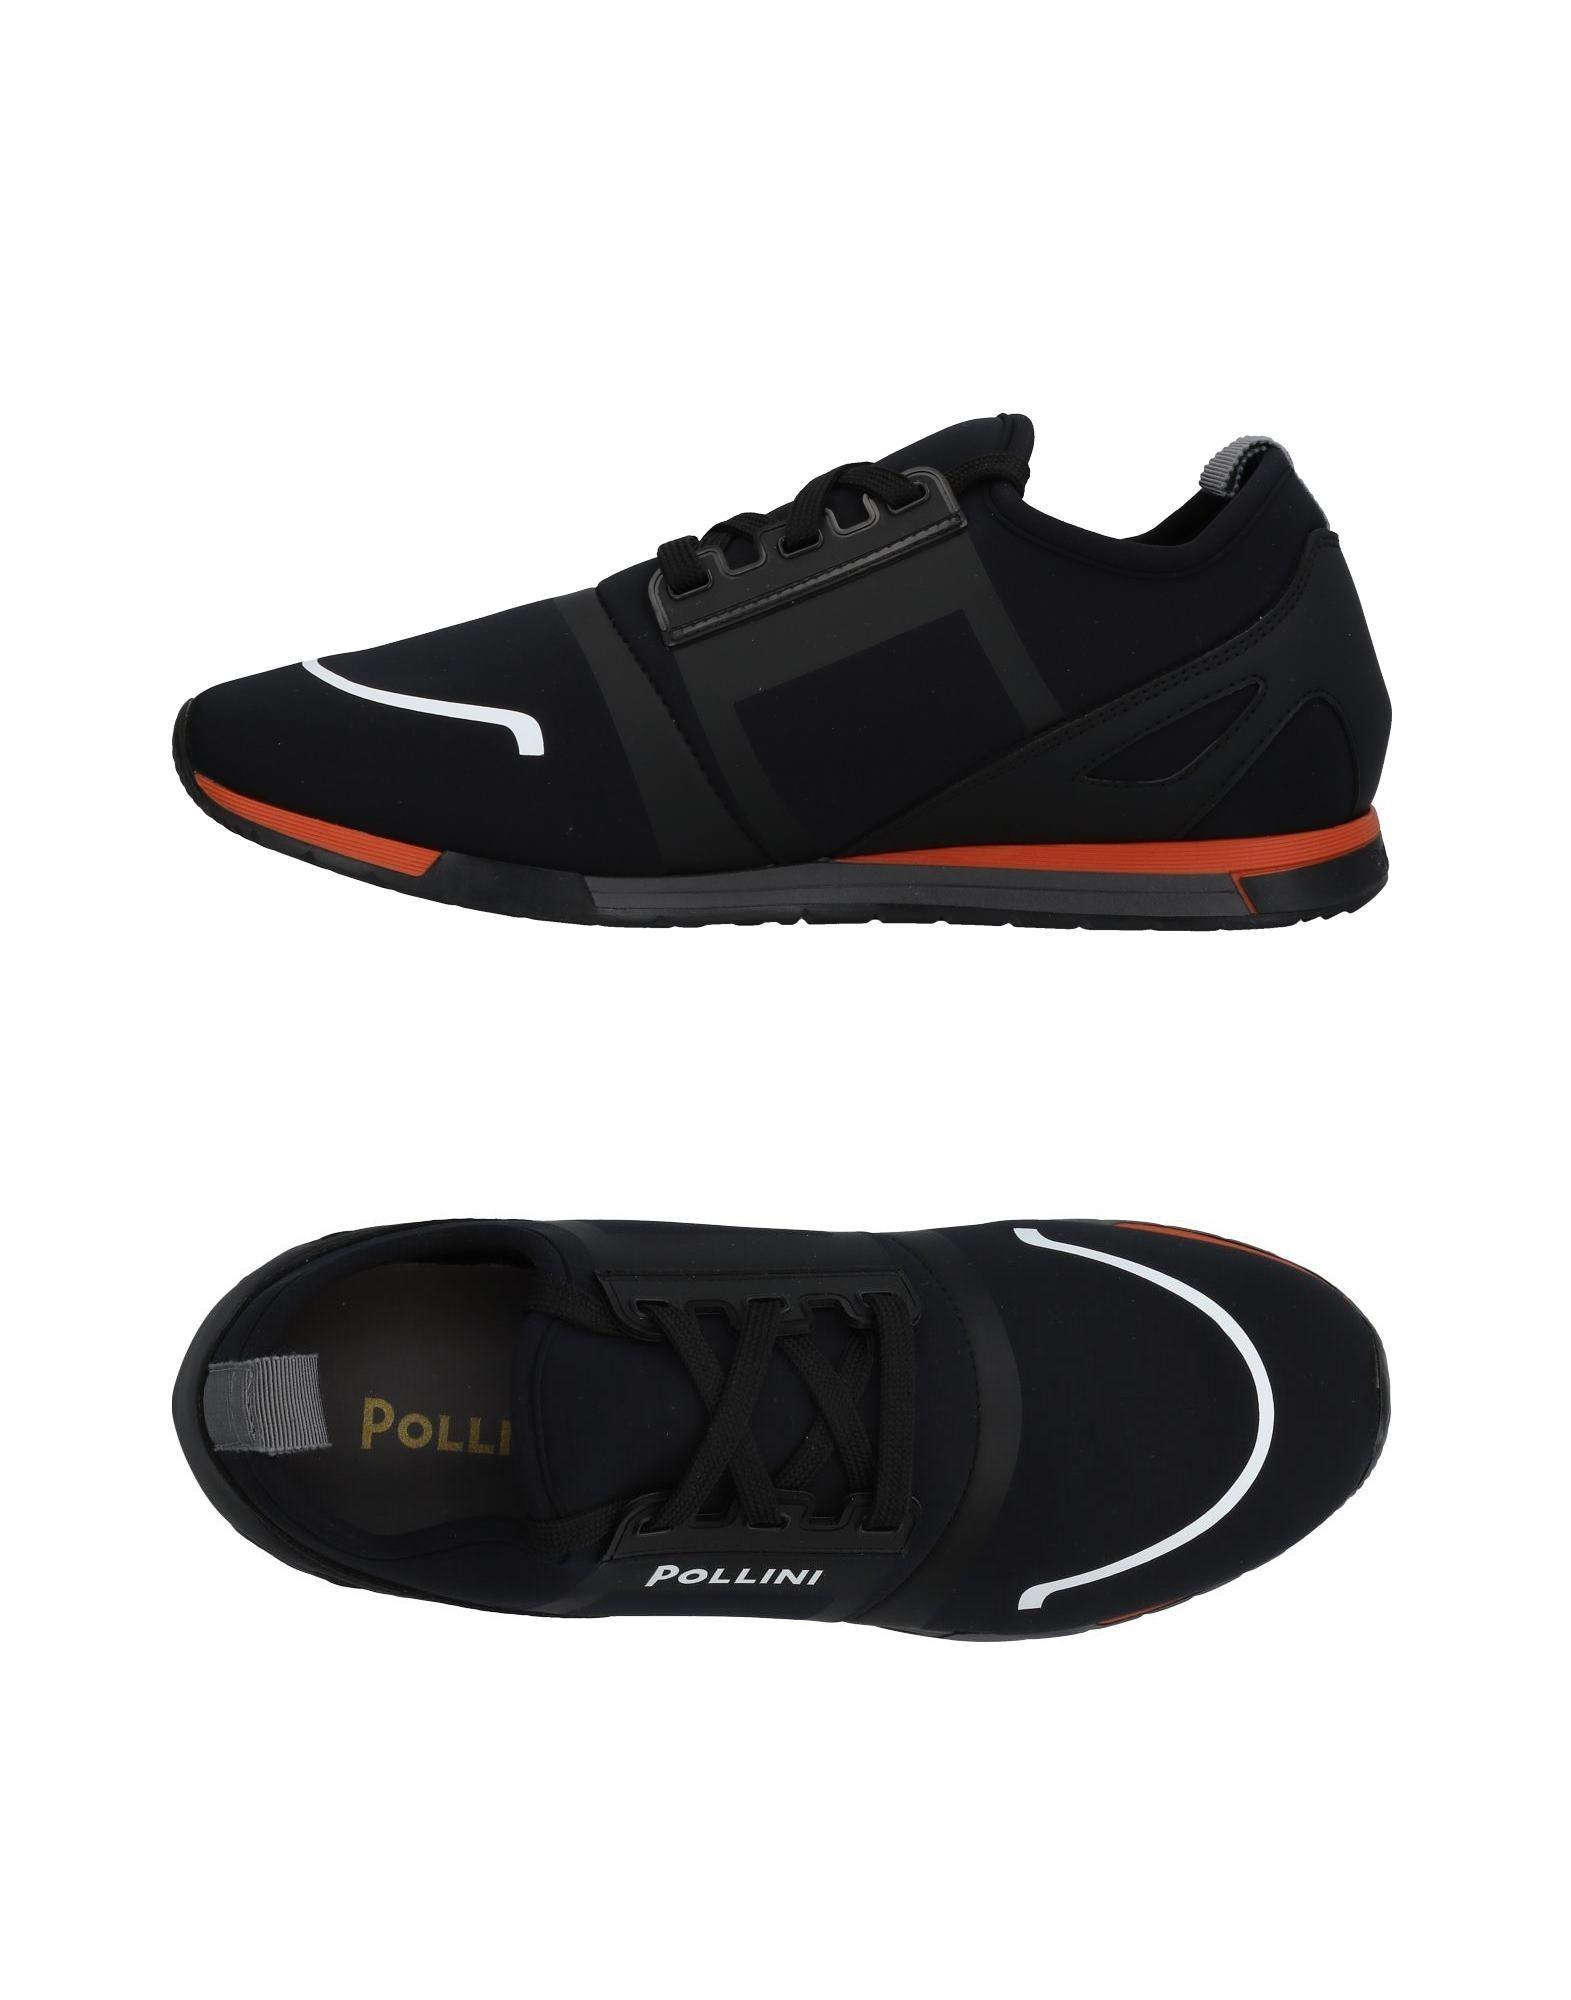 FOOTWEAR - Low-tops & sneakers Pollini 0ZvI6